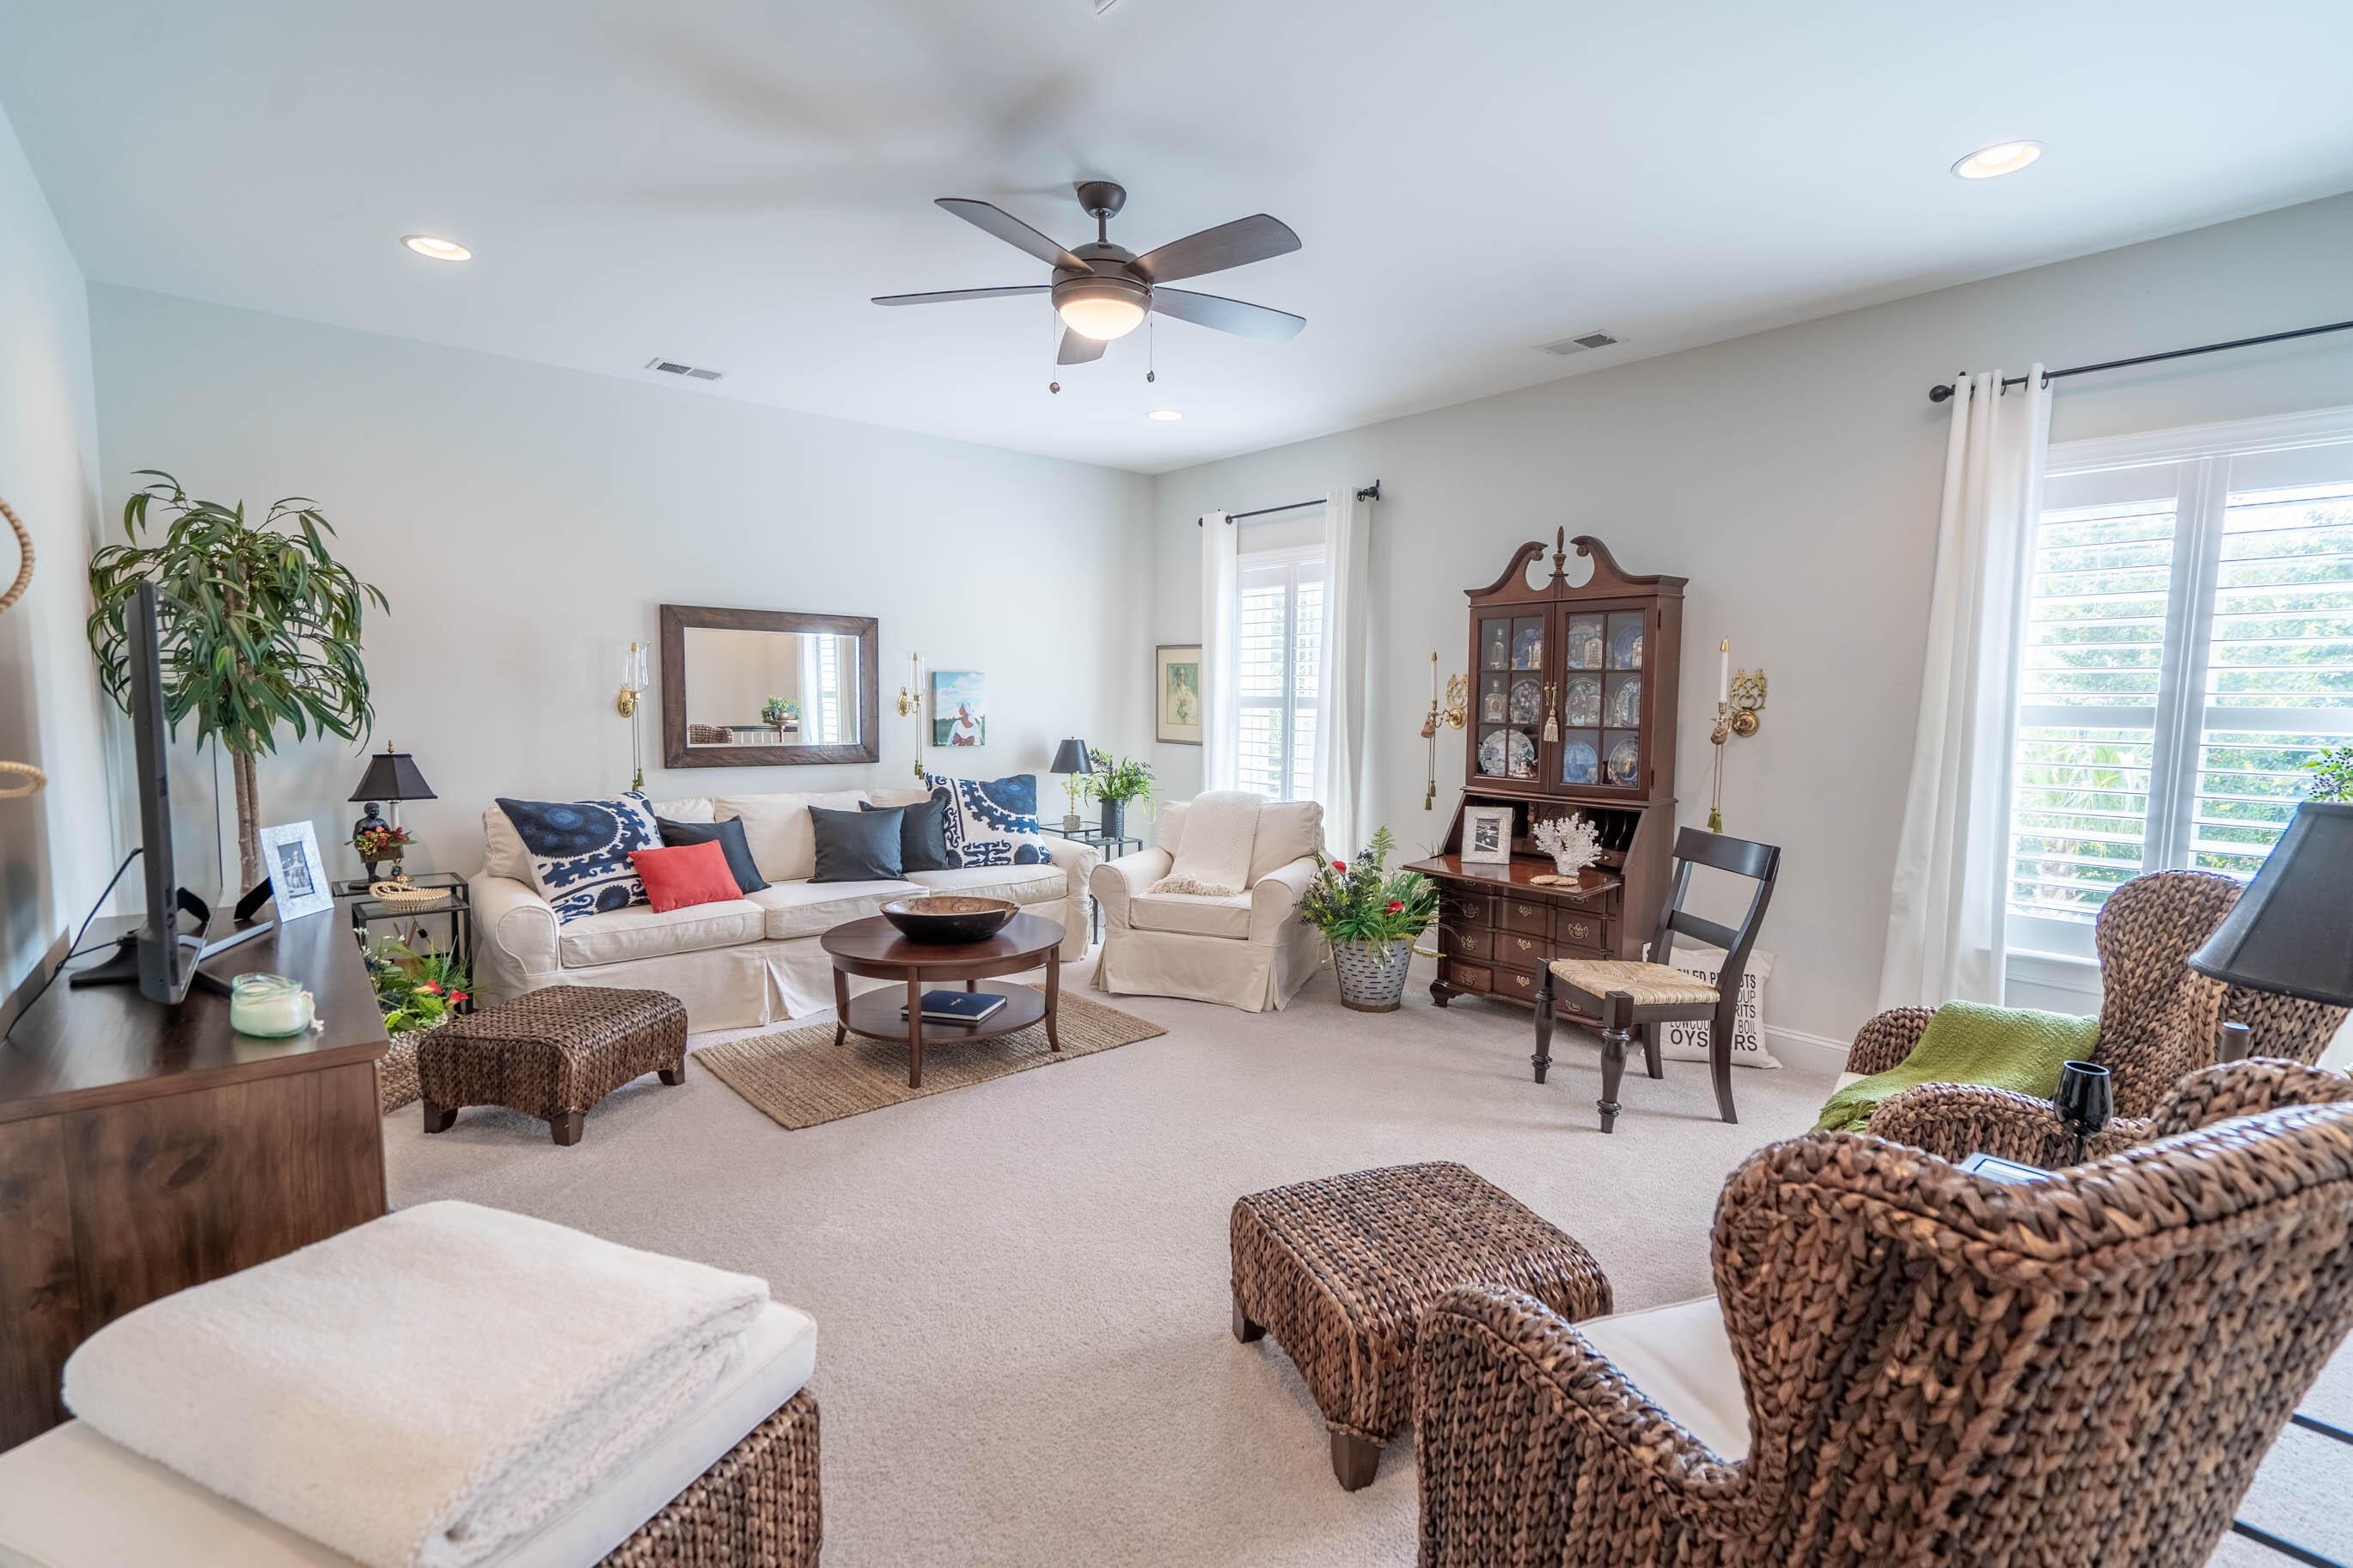 Park West Homes For Sale - 1479 Brightwood, Mount Pleasant, SC - 5